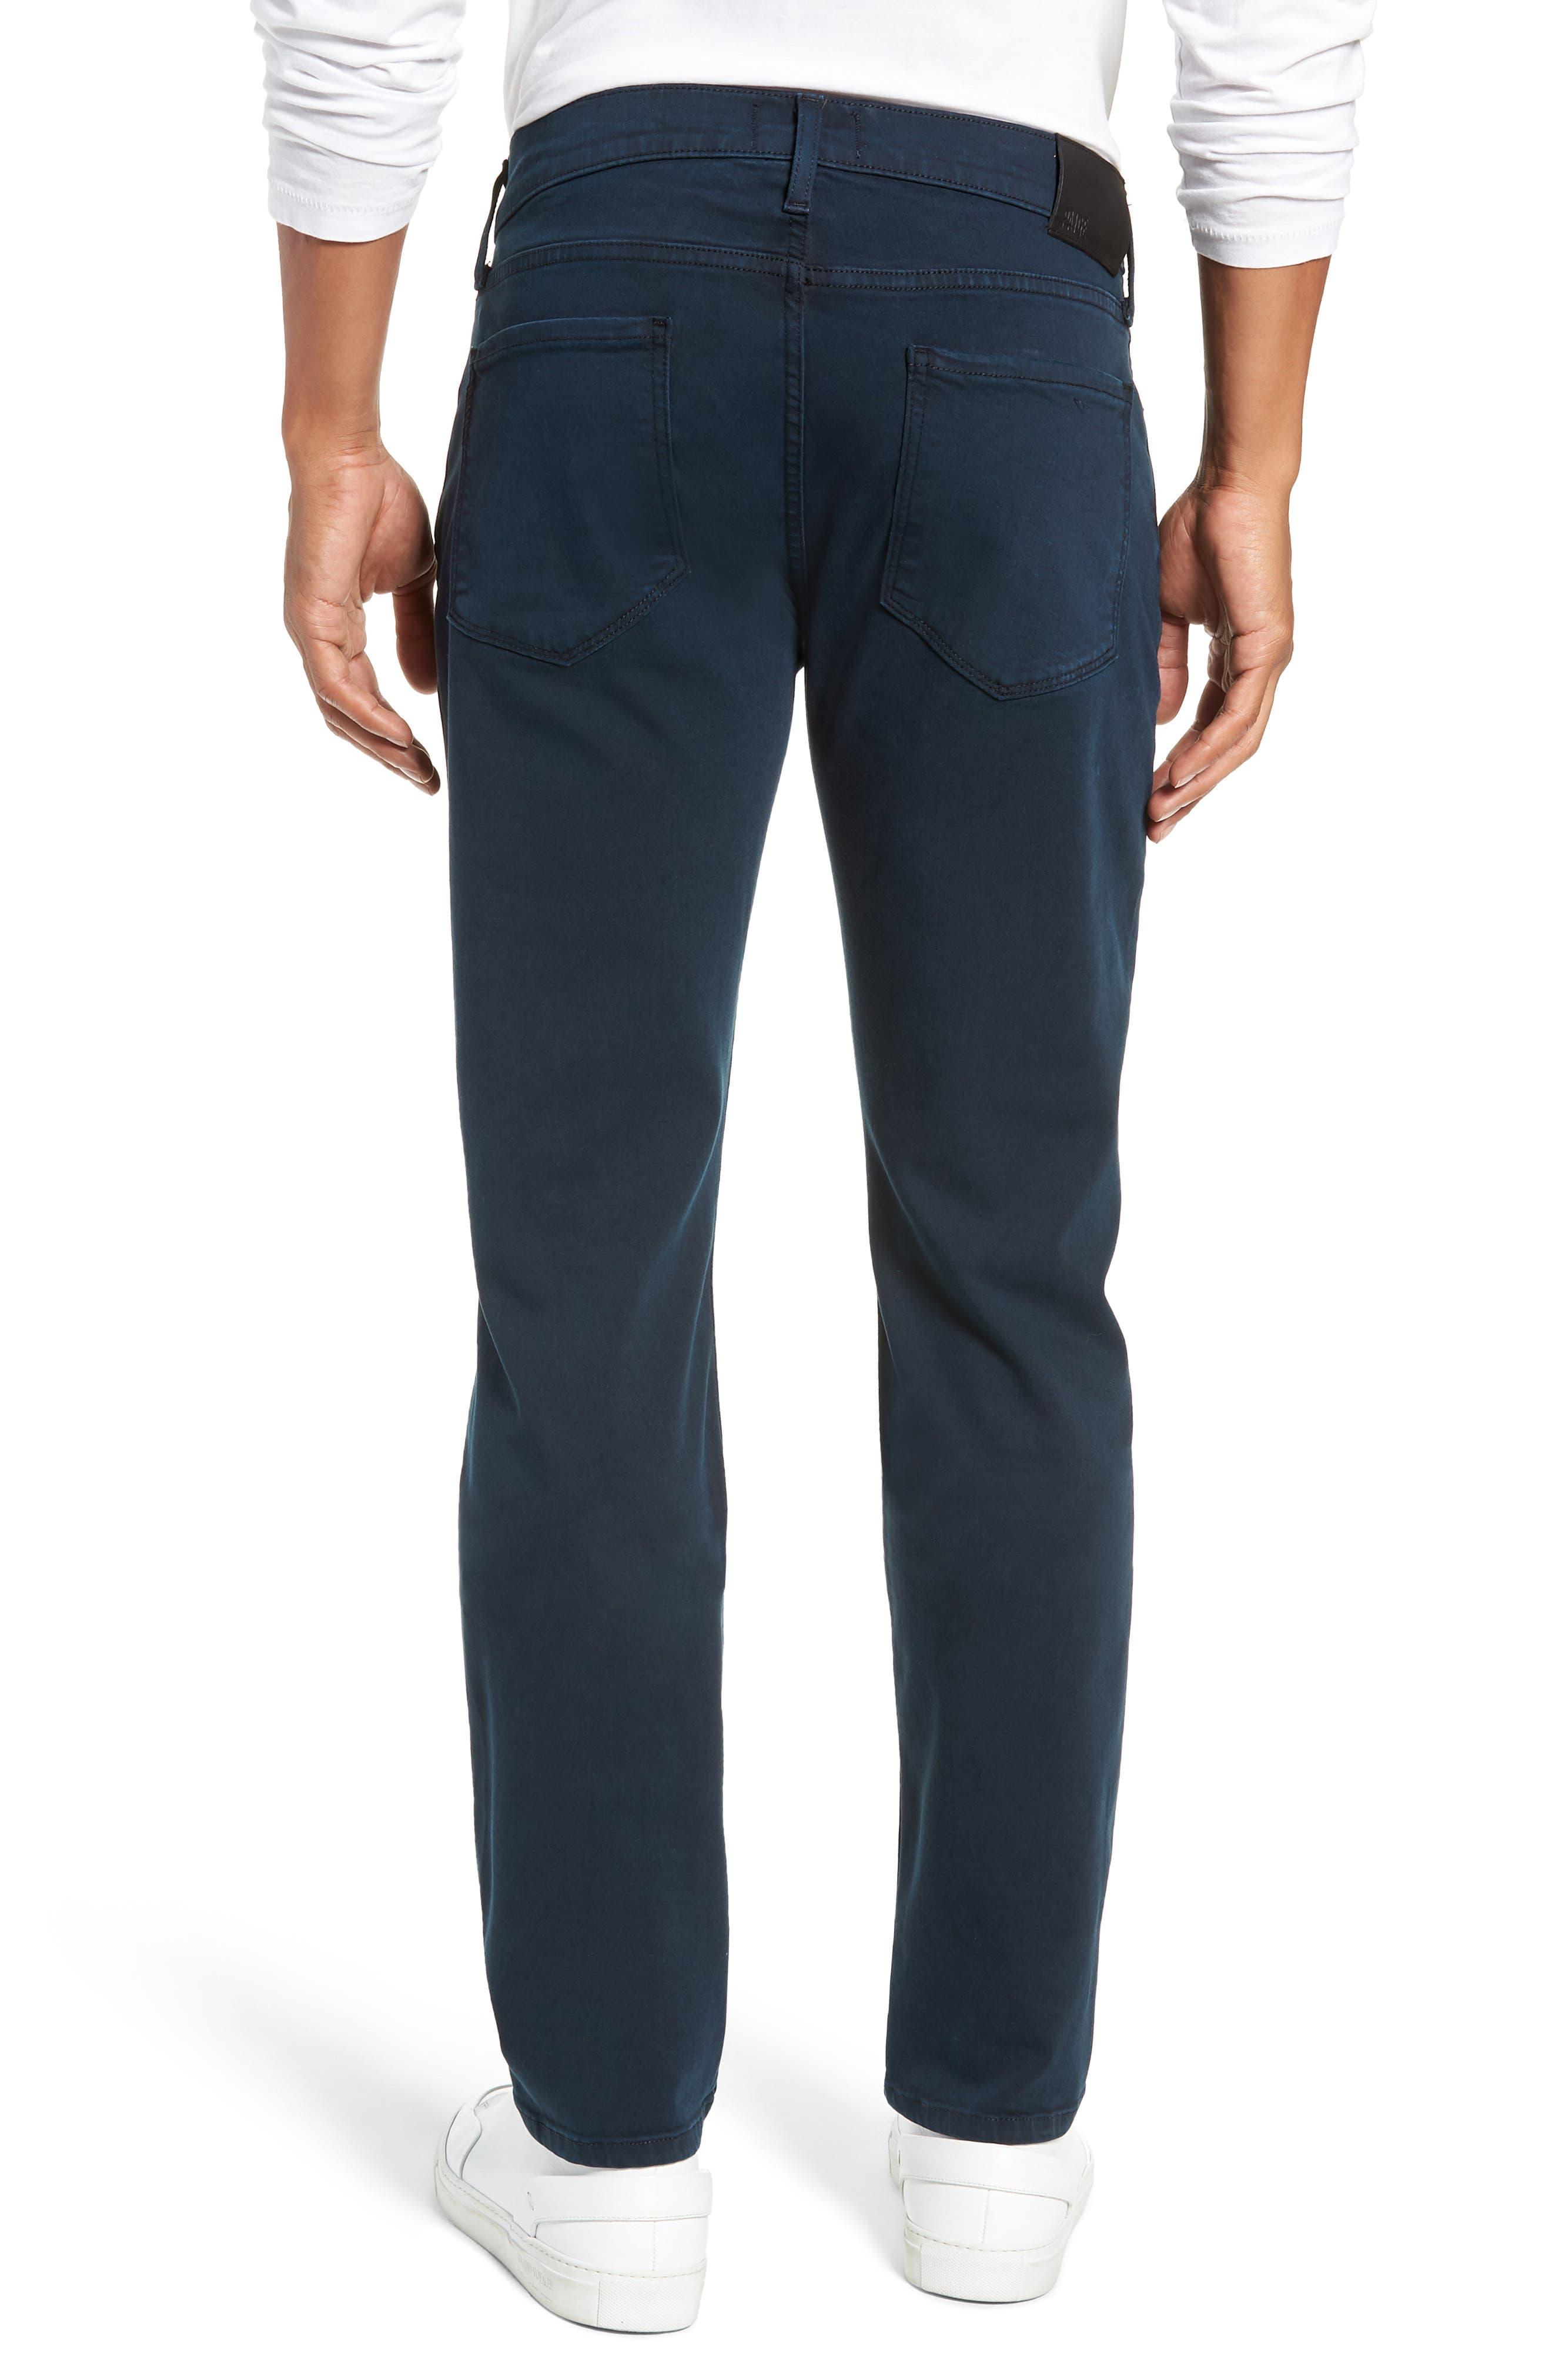 Transcend - Federal Slim Straight Leg Jeans,                             Alternate thumbnail 2, color,                             VINTAGE SKYFALL